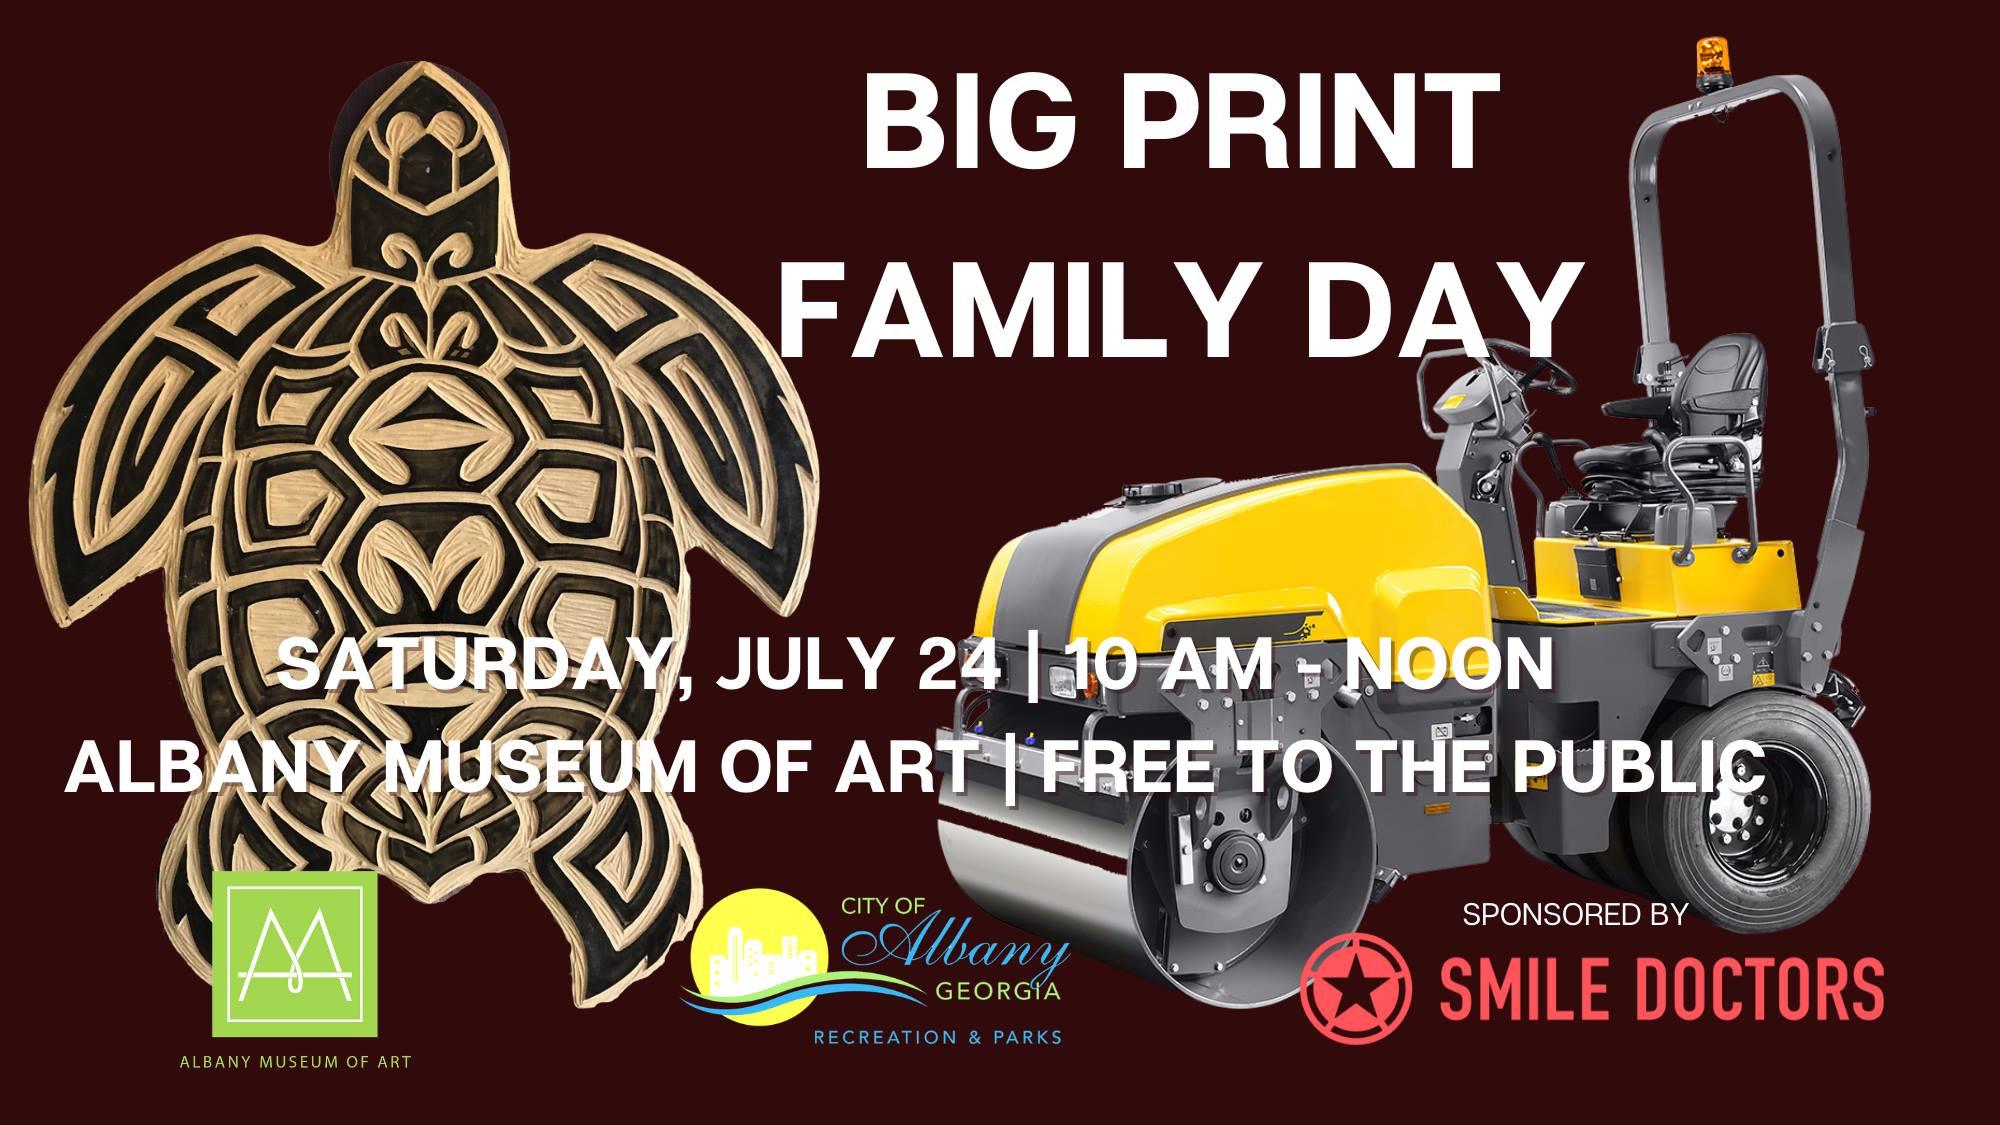 AMA Big Print Family Day